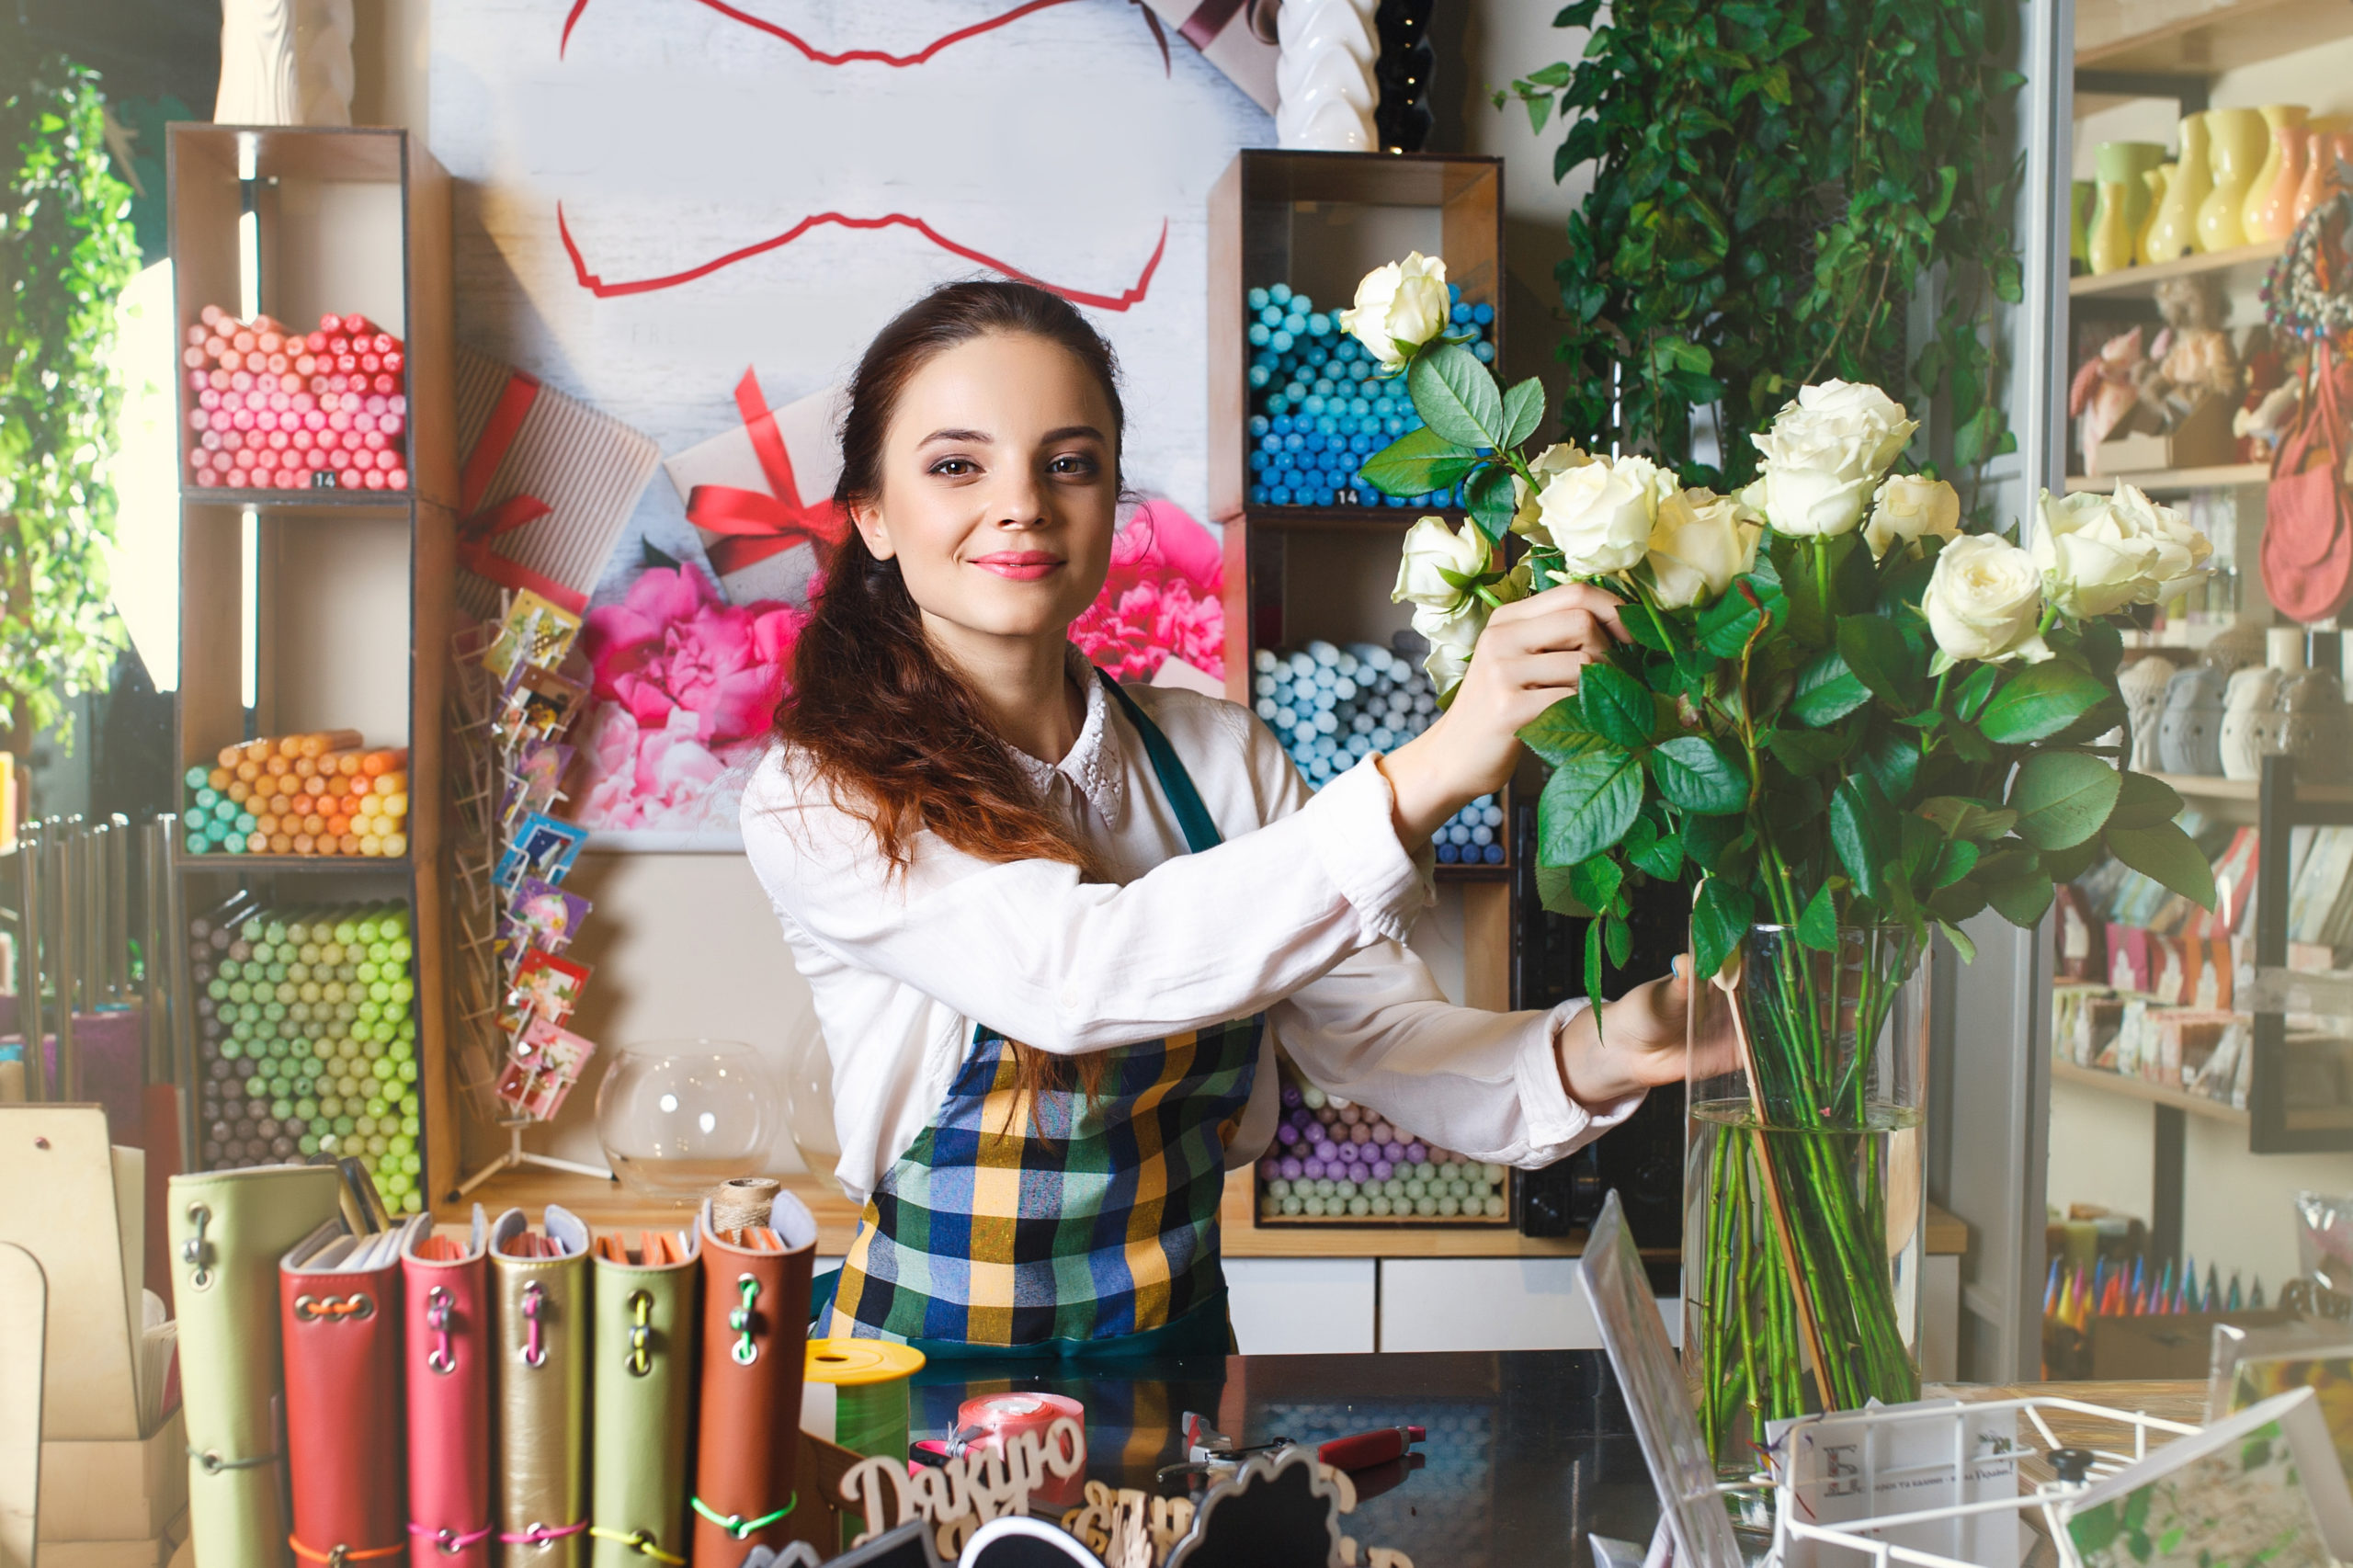 Florist Arranging Flowers In Shop